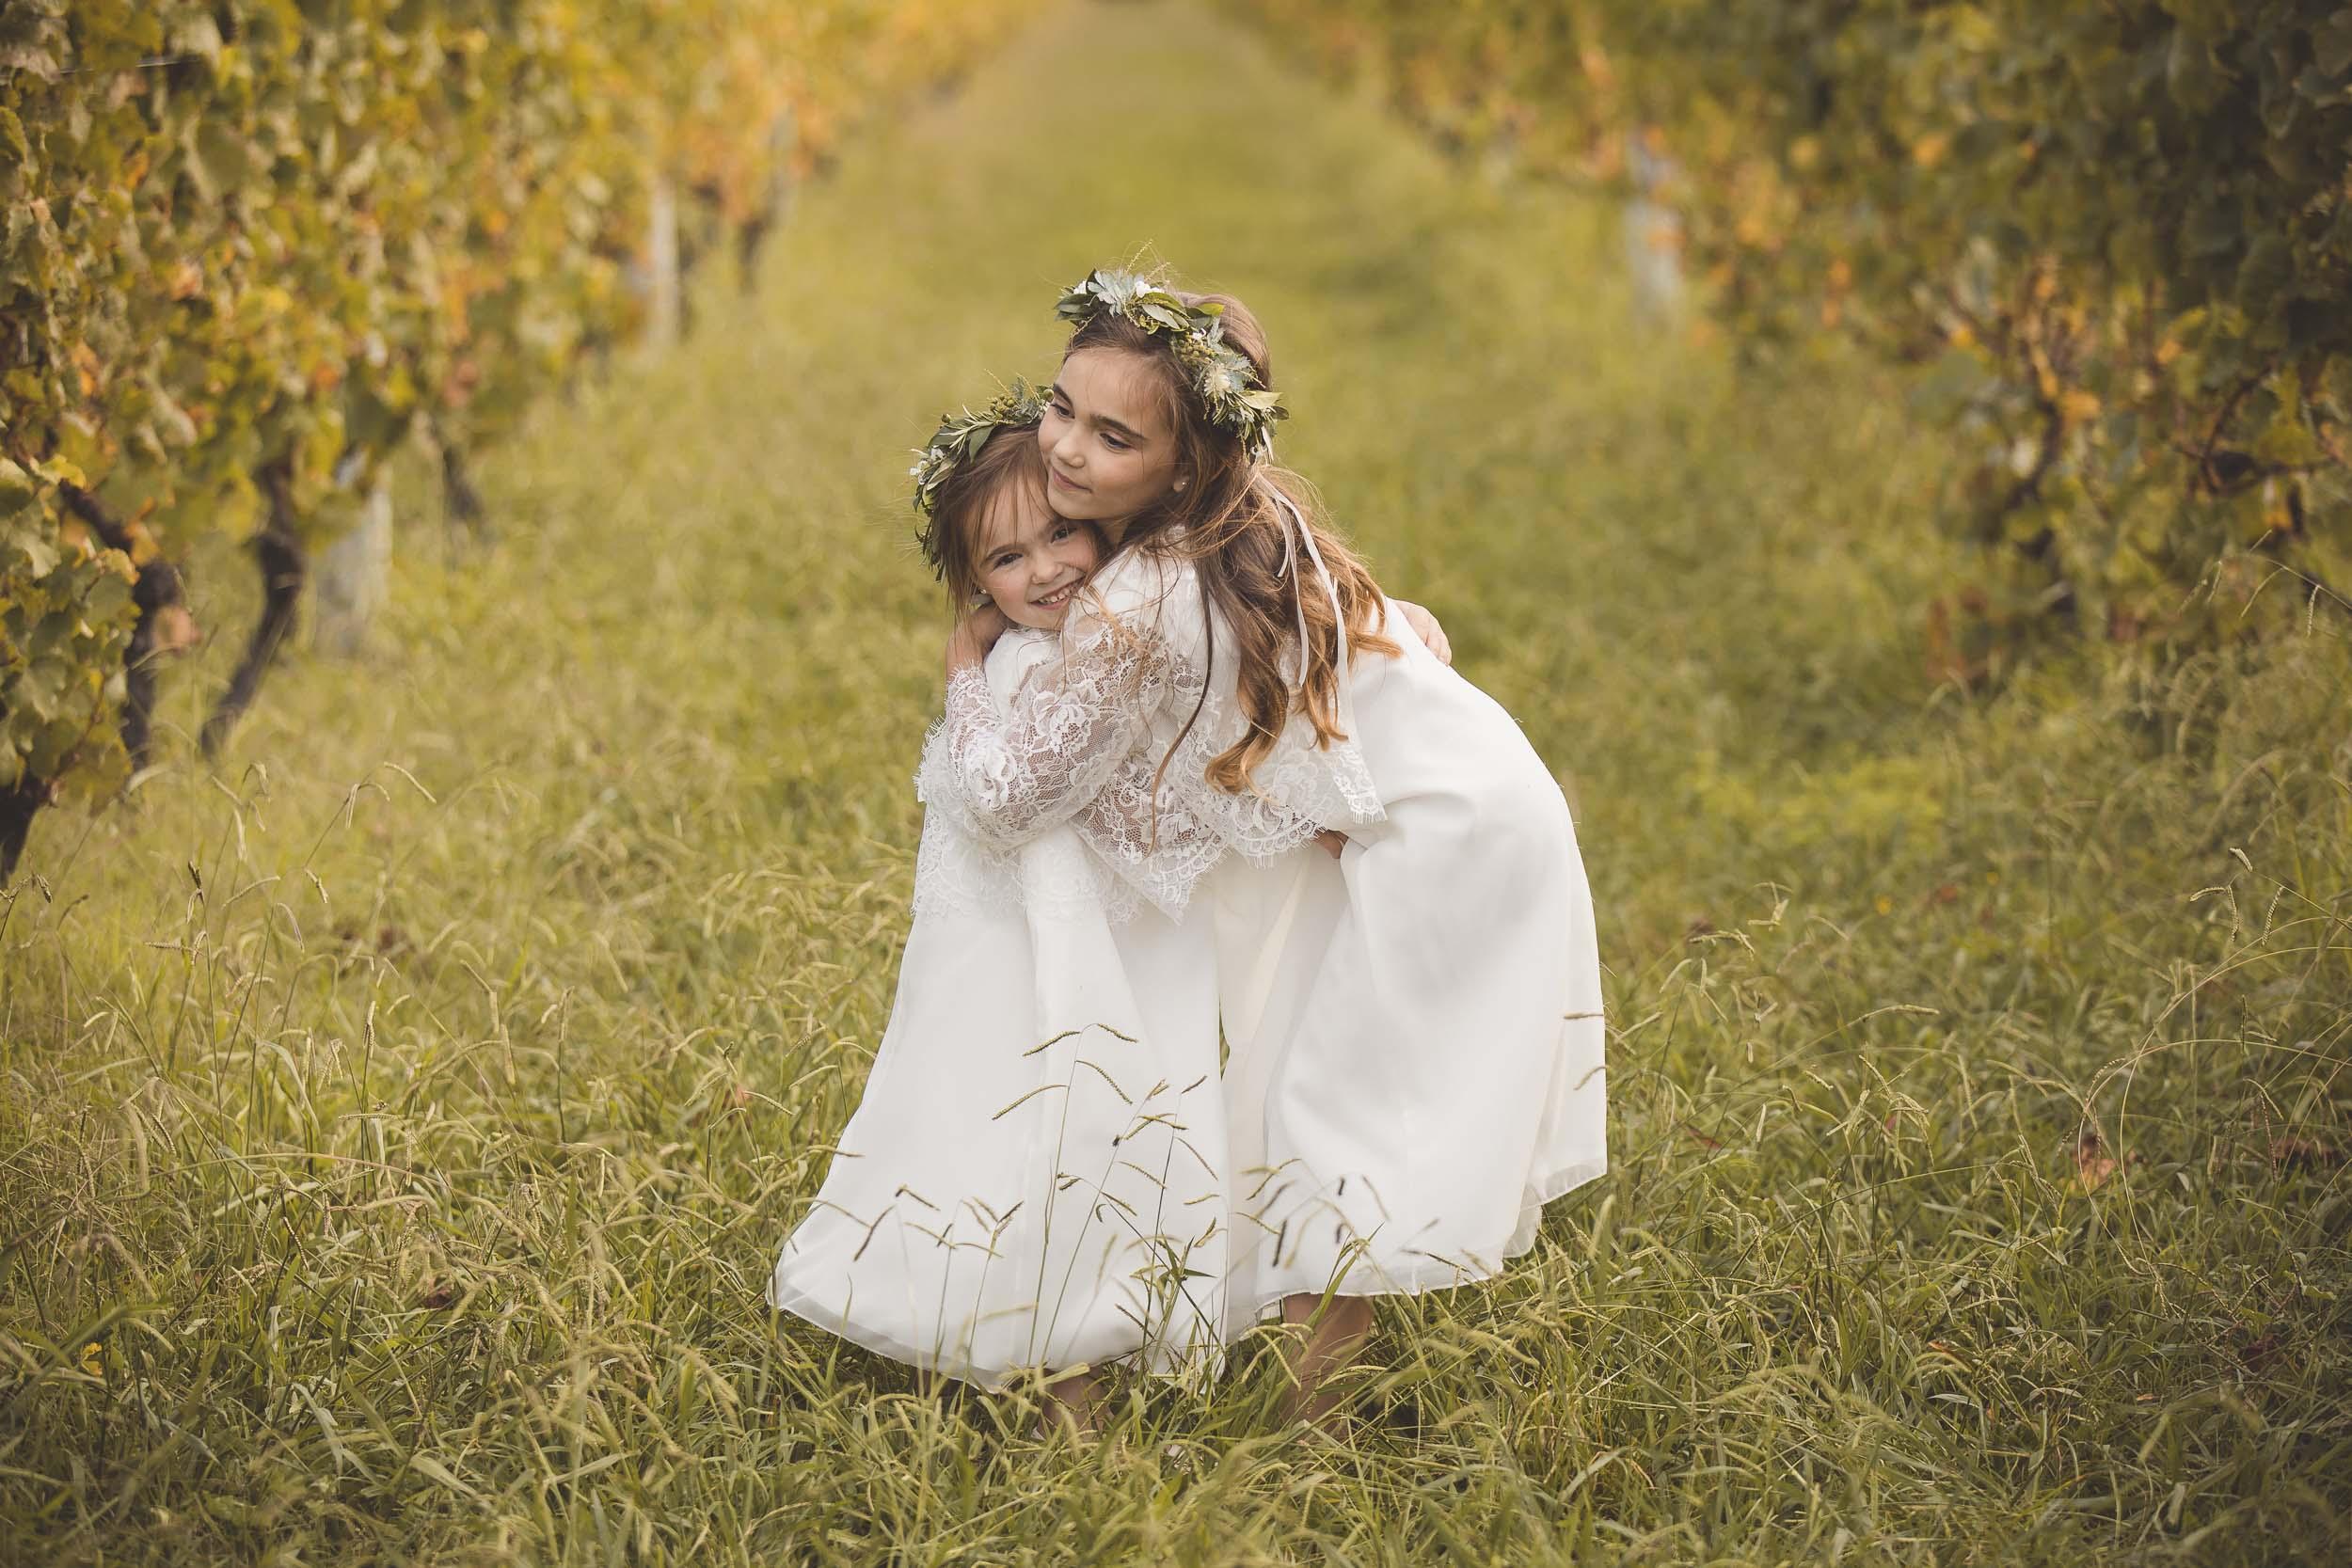 nz wedding photographers eva bradley